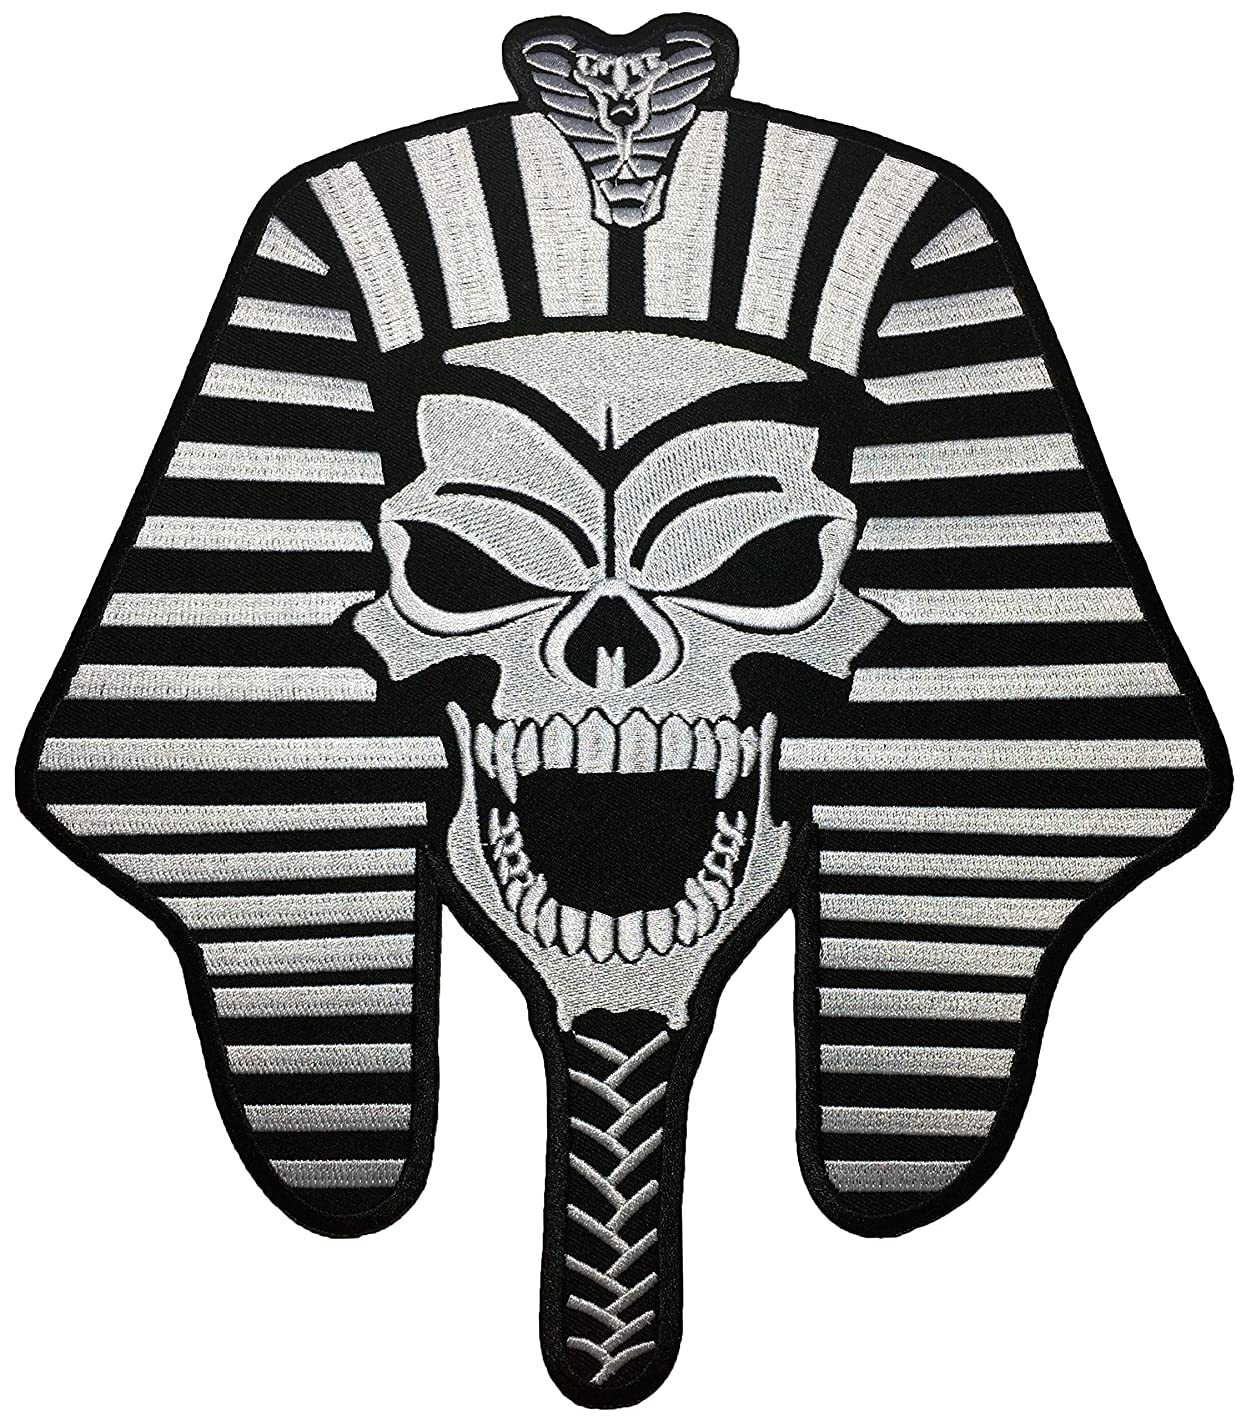 [Large Size] Papapatch Pharaoh Skull Skeleton Ghost Mummy Egypt God King Biker Punk Ride Motorcycle Costume Jacket DIY Embroidered Sew Iron on Patch (IRON-PHARAOH-SKULL-LARGE)